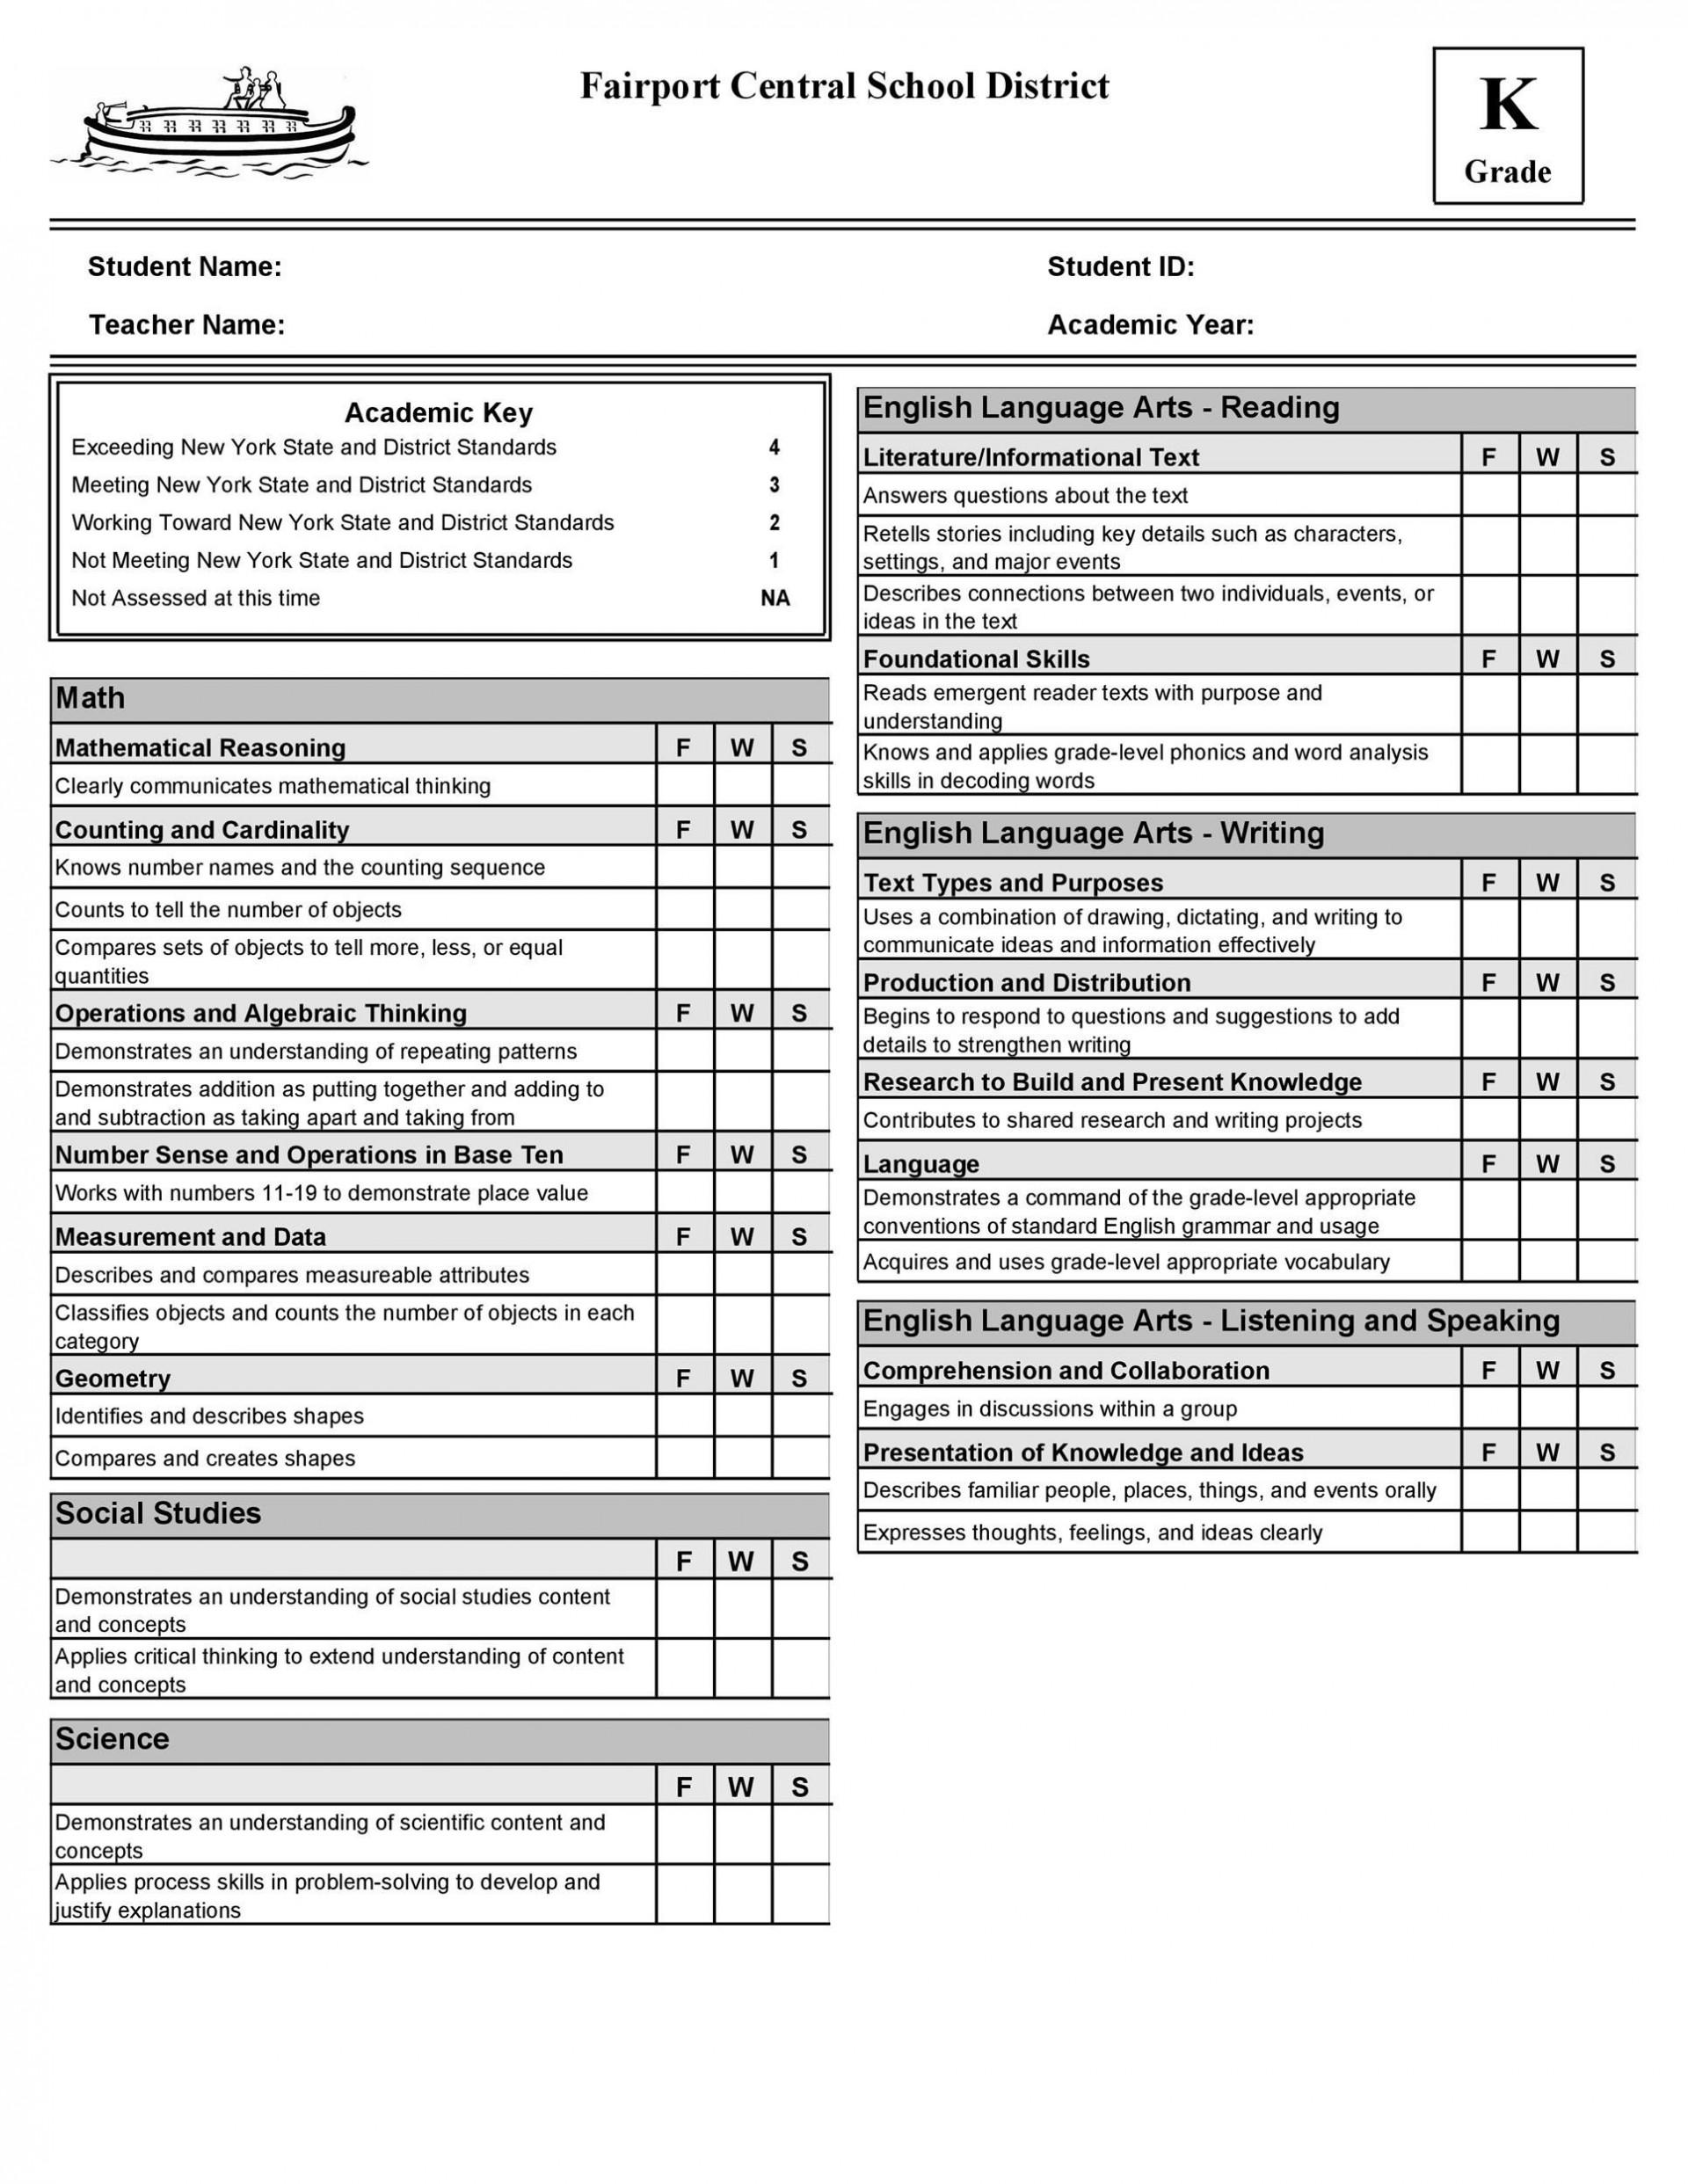 006 Incredible Junior High School Report Card Template Example 1920